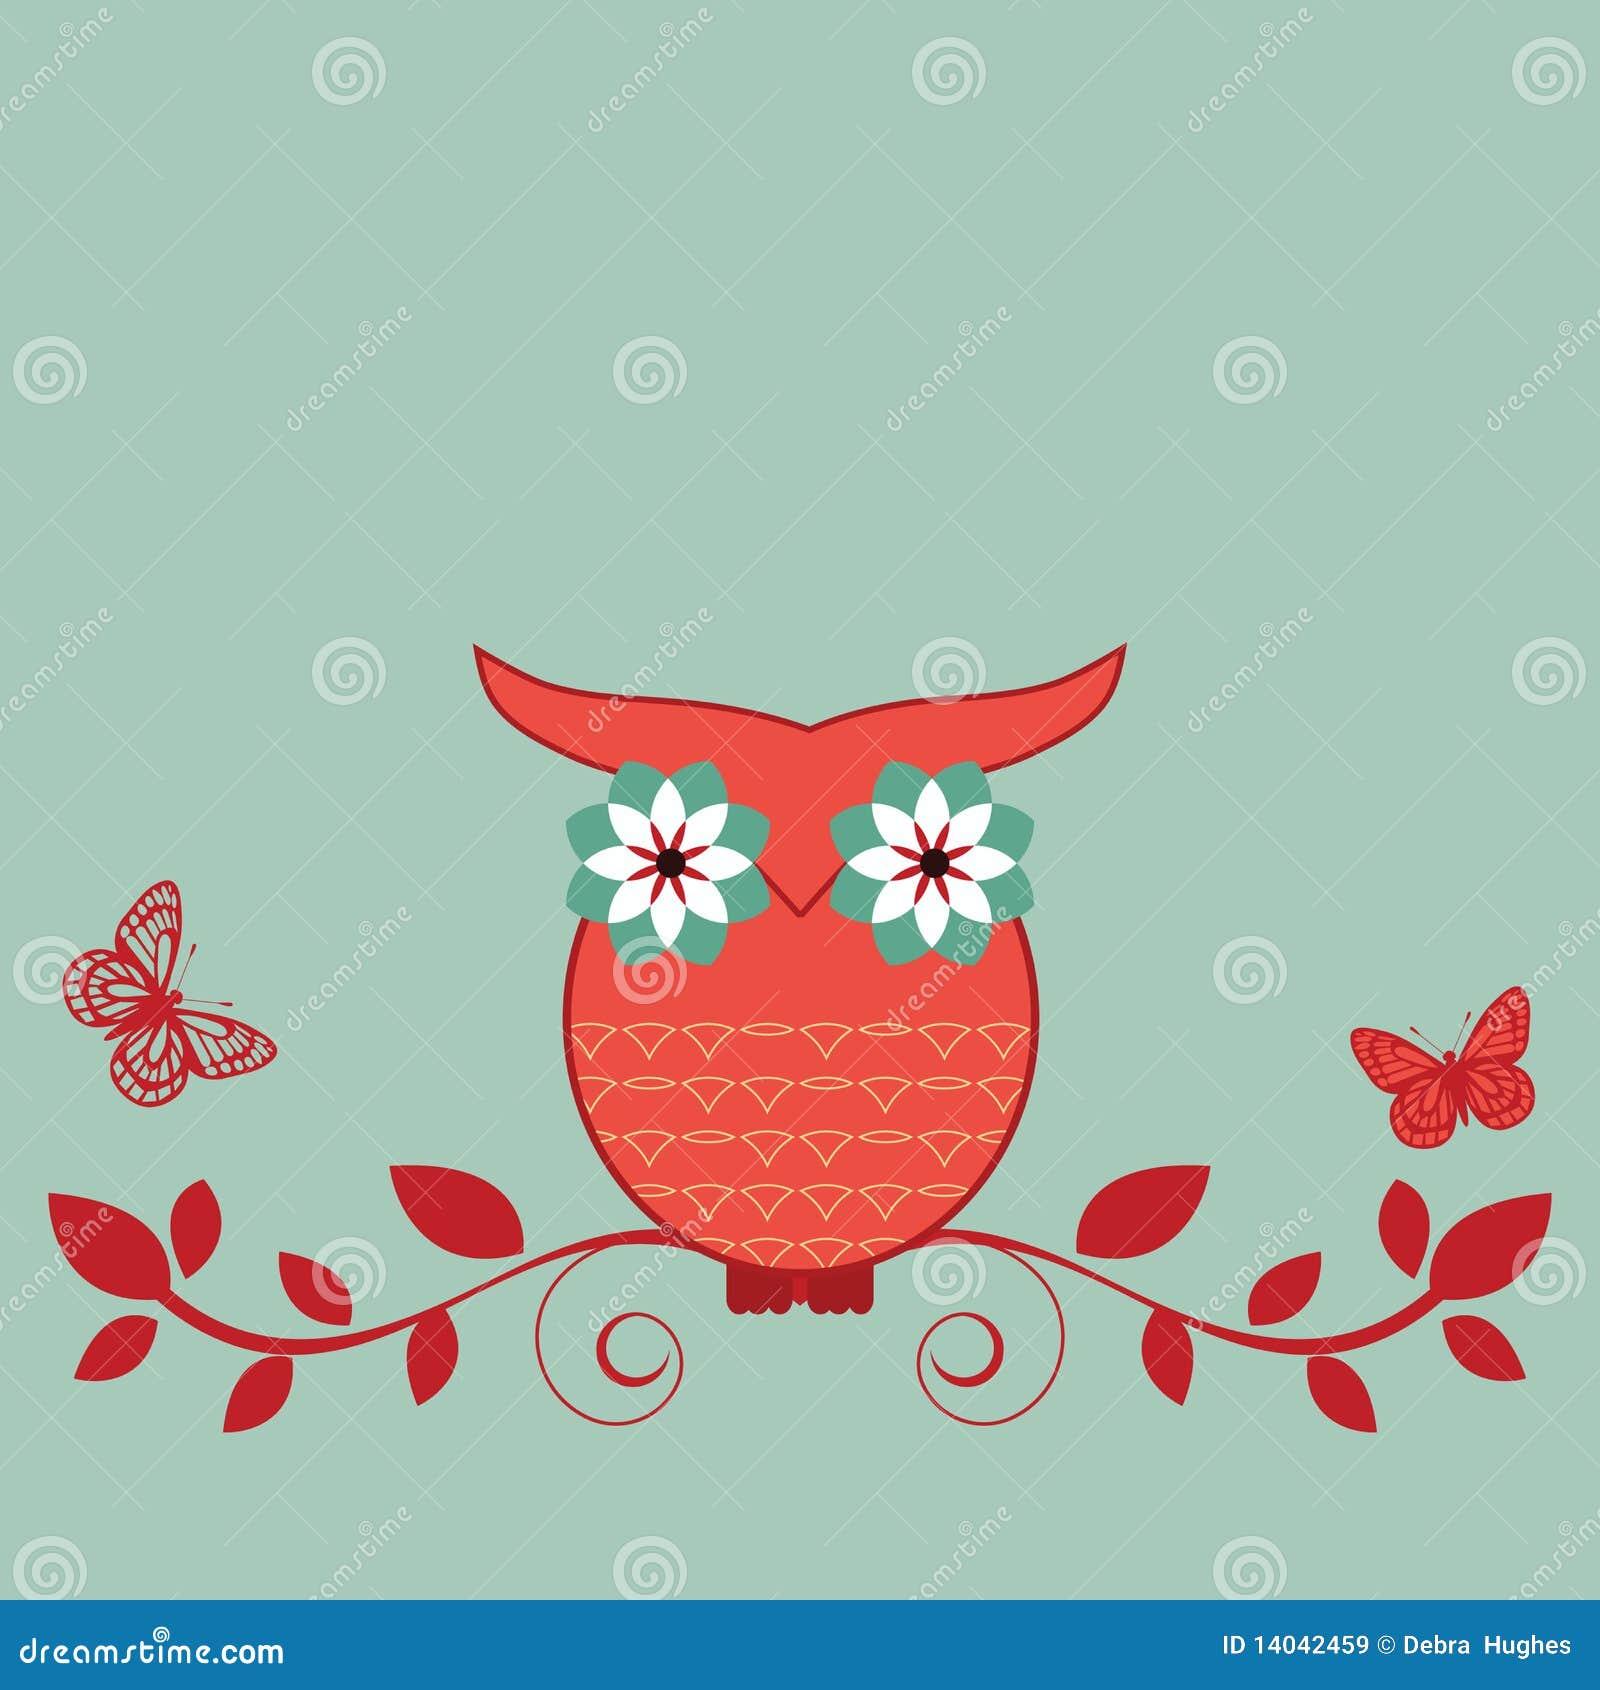 Owl on a vine